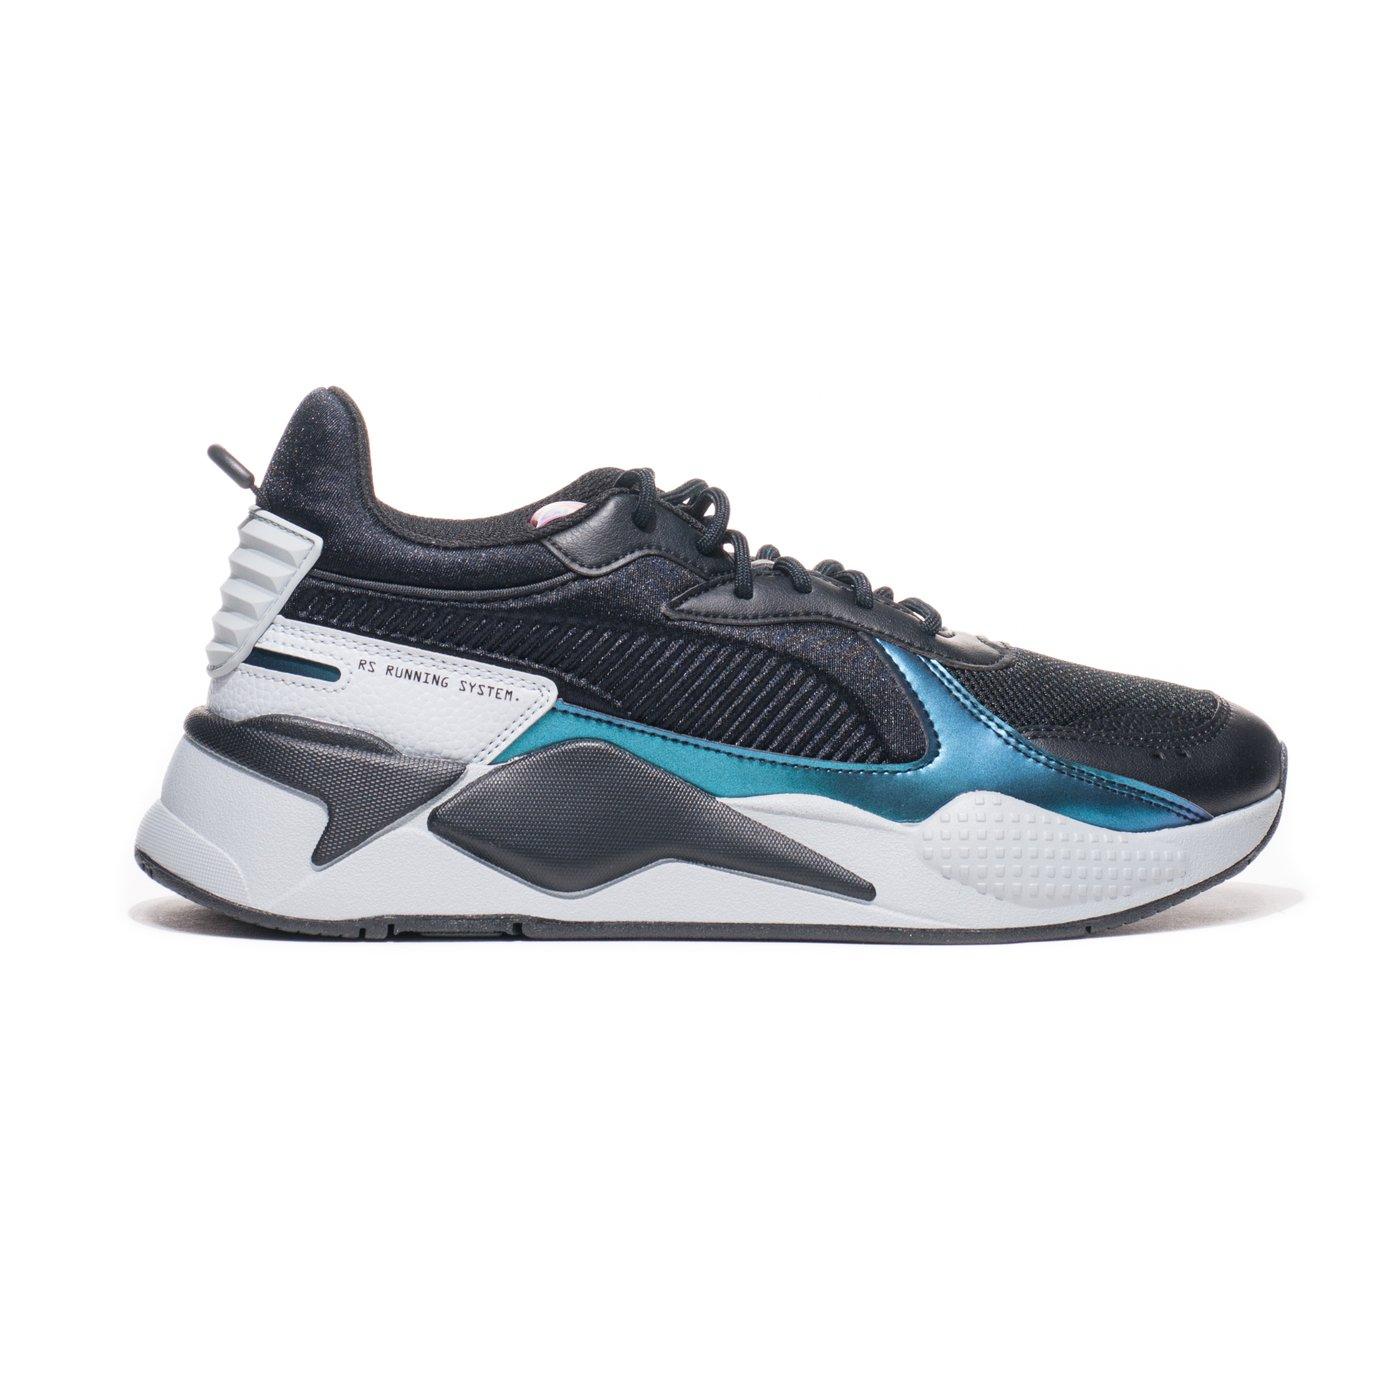 Кросівки чоловічі Puma RS-X FUTURVERSE